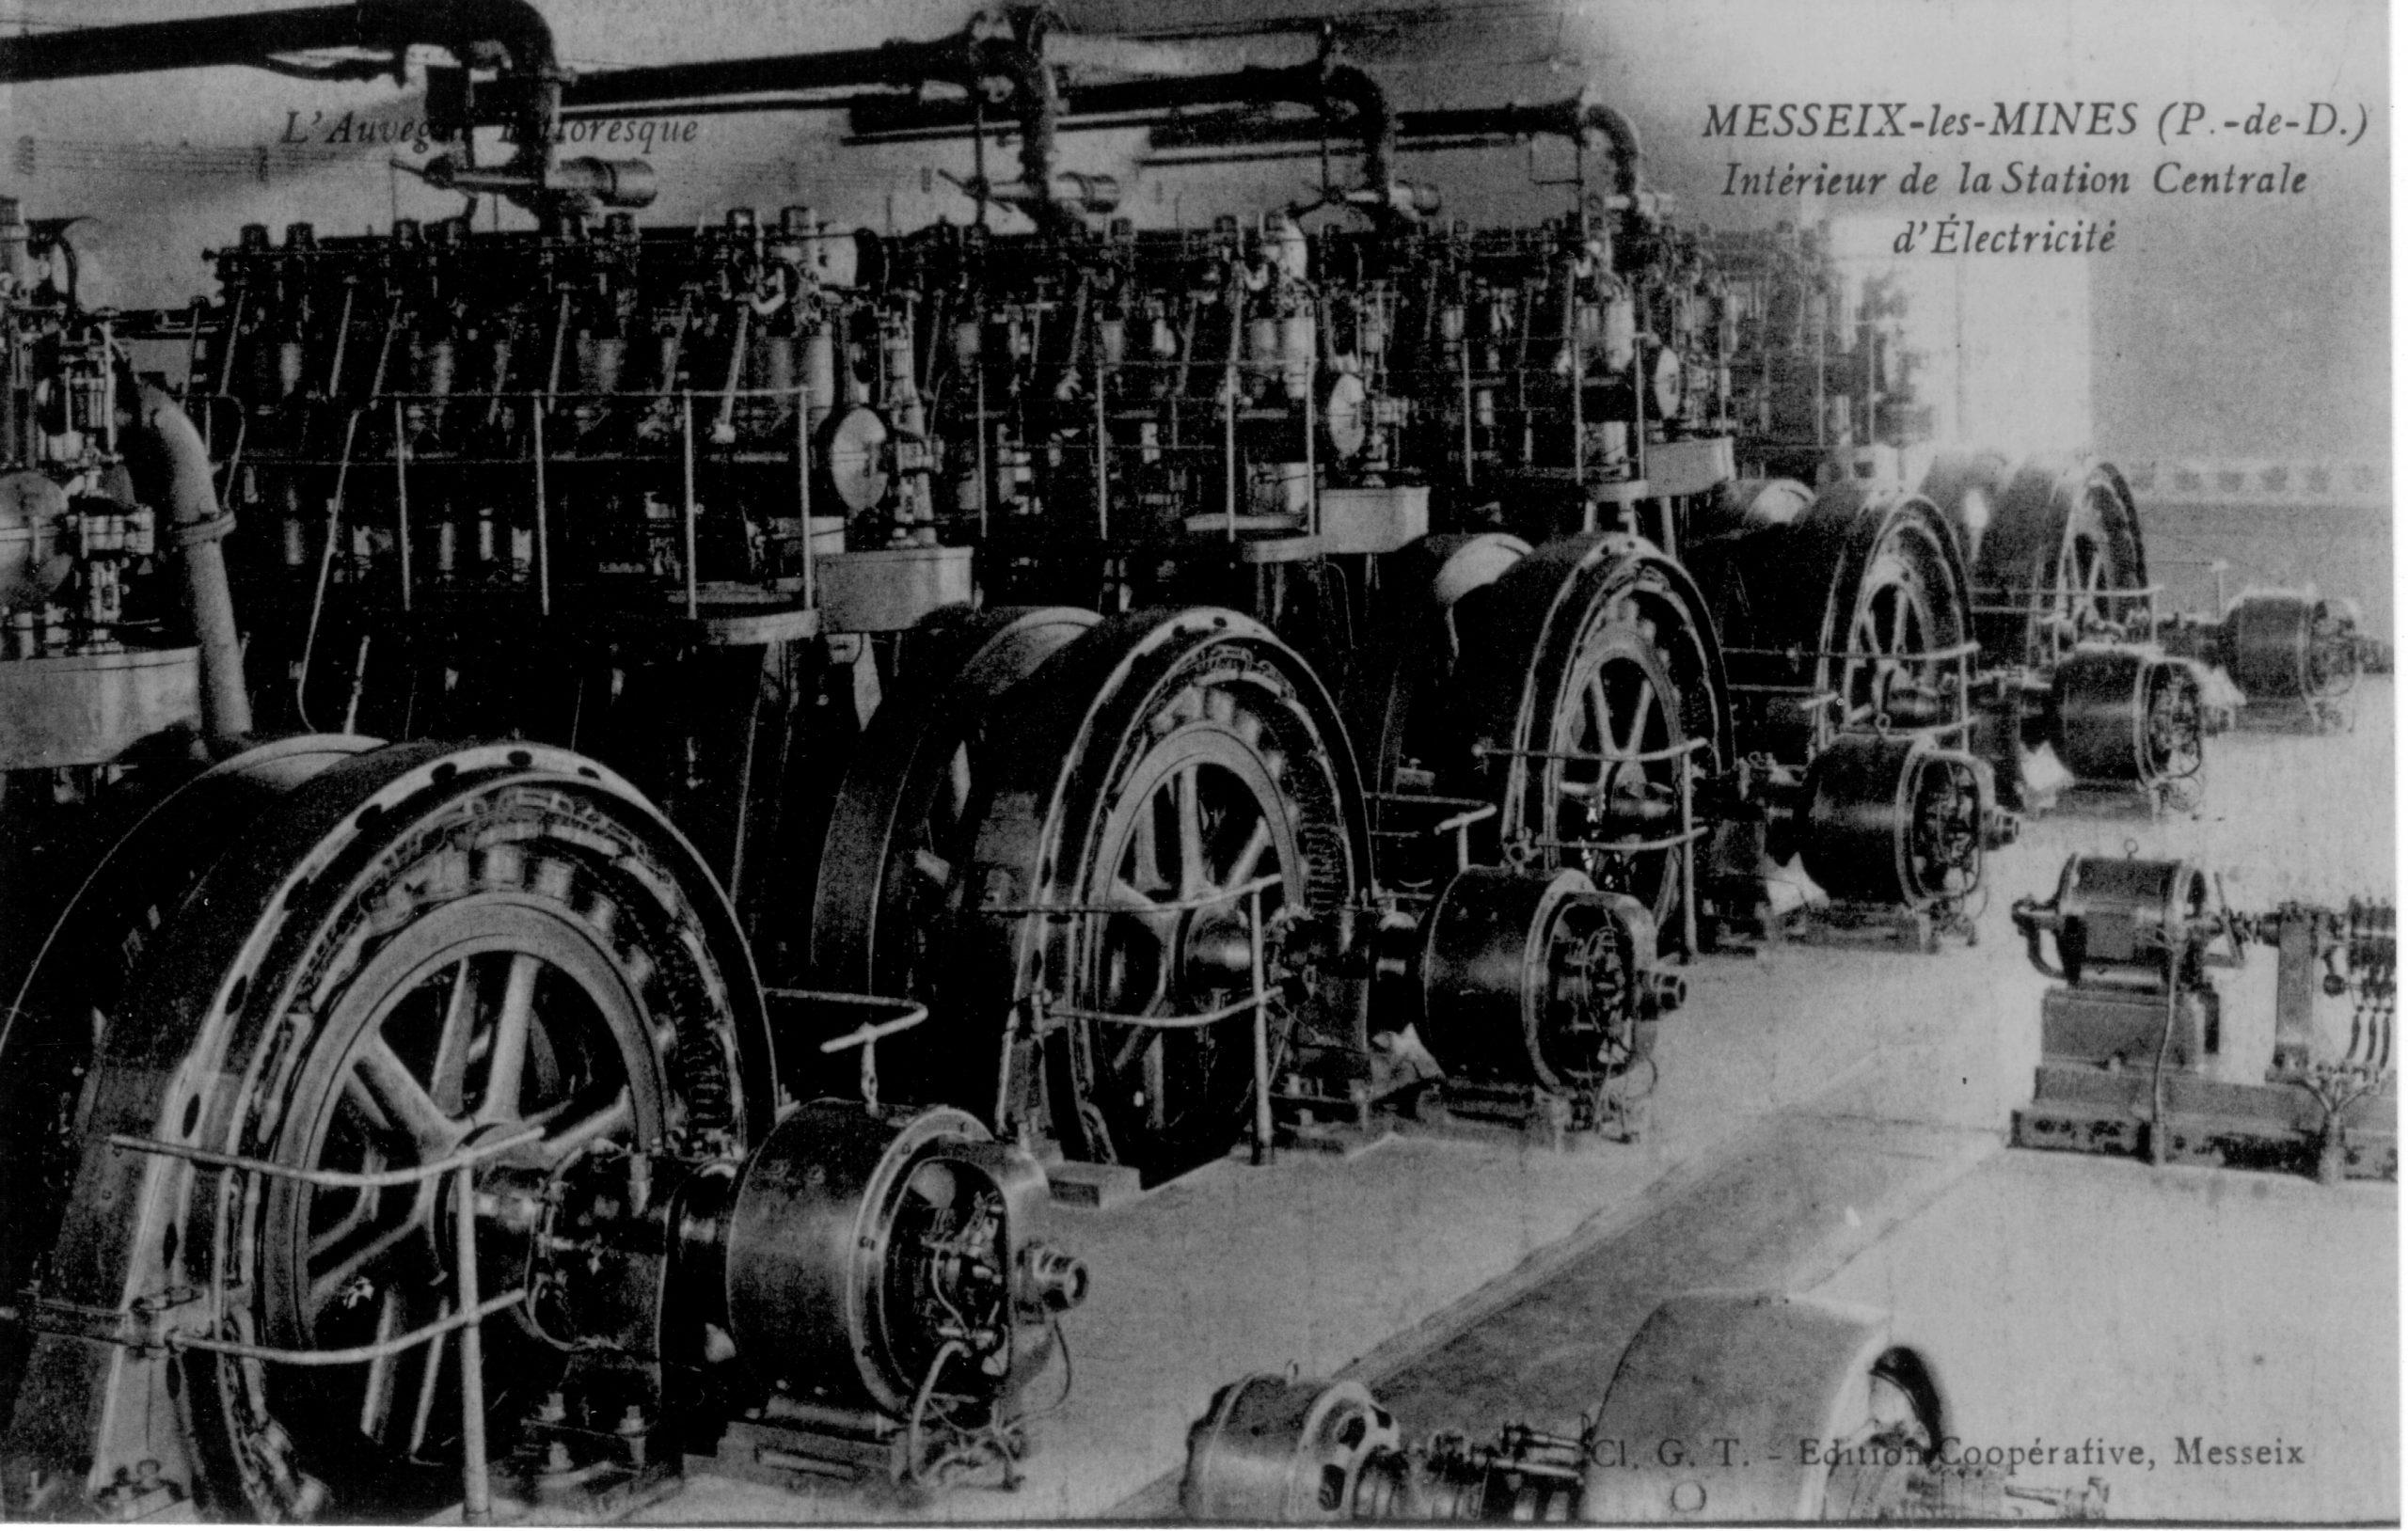 histoire de la mine de Messeix - Le Puits TEYRAS